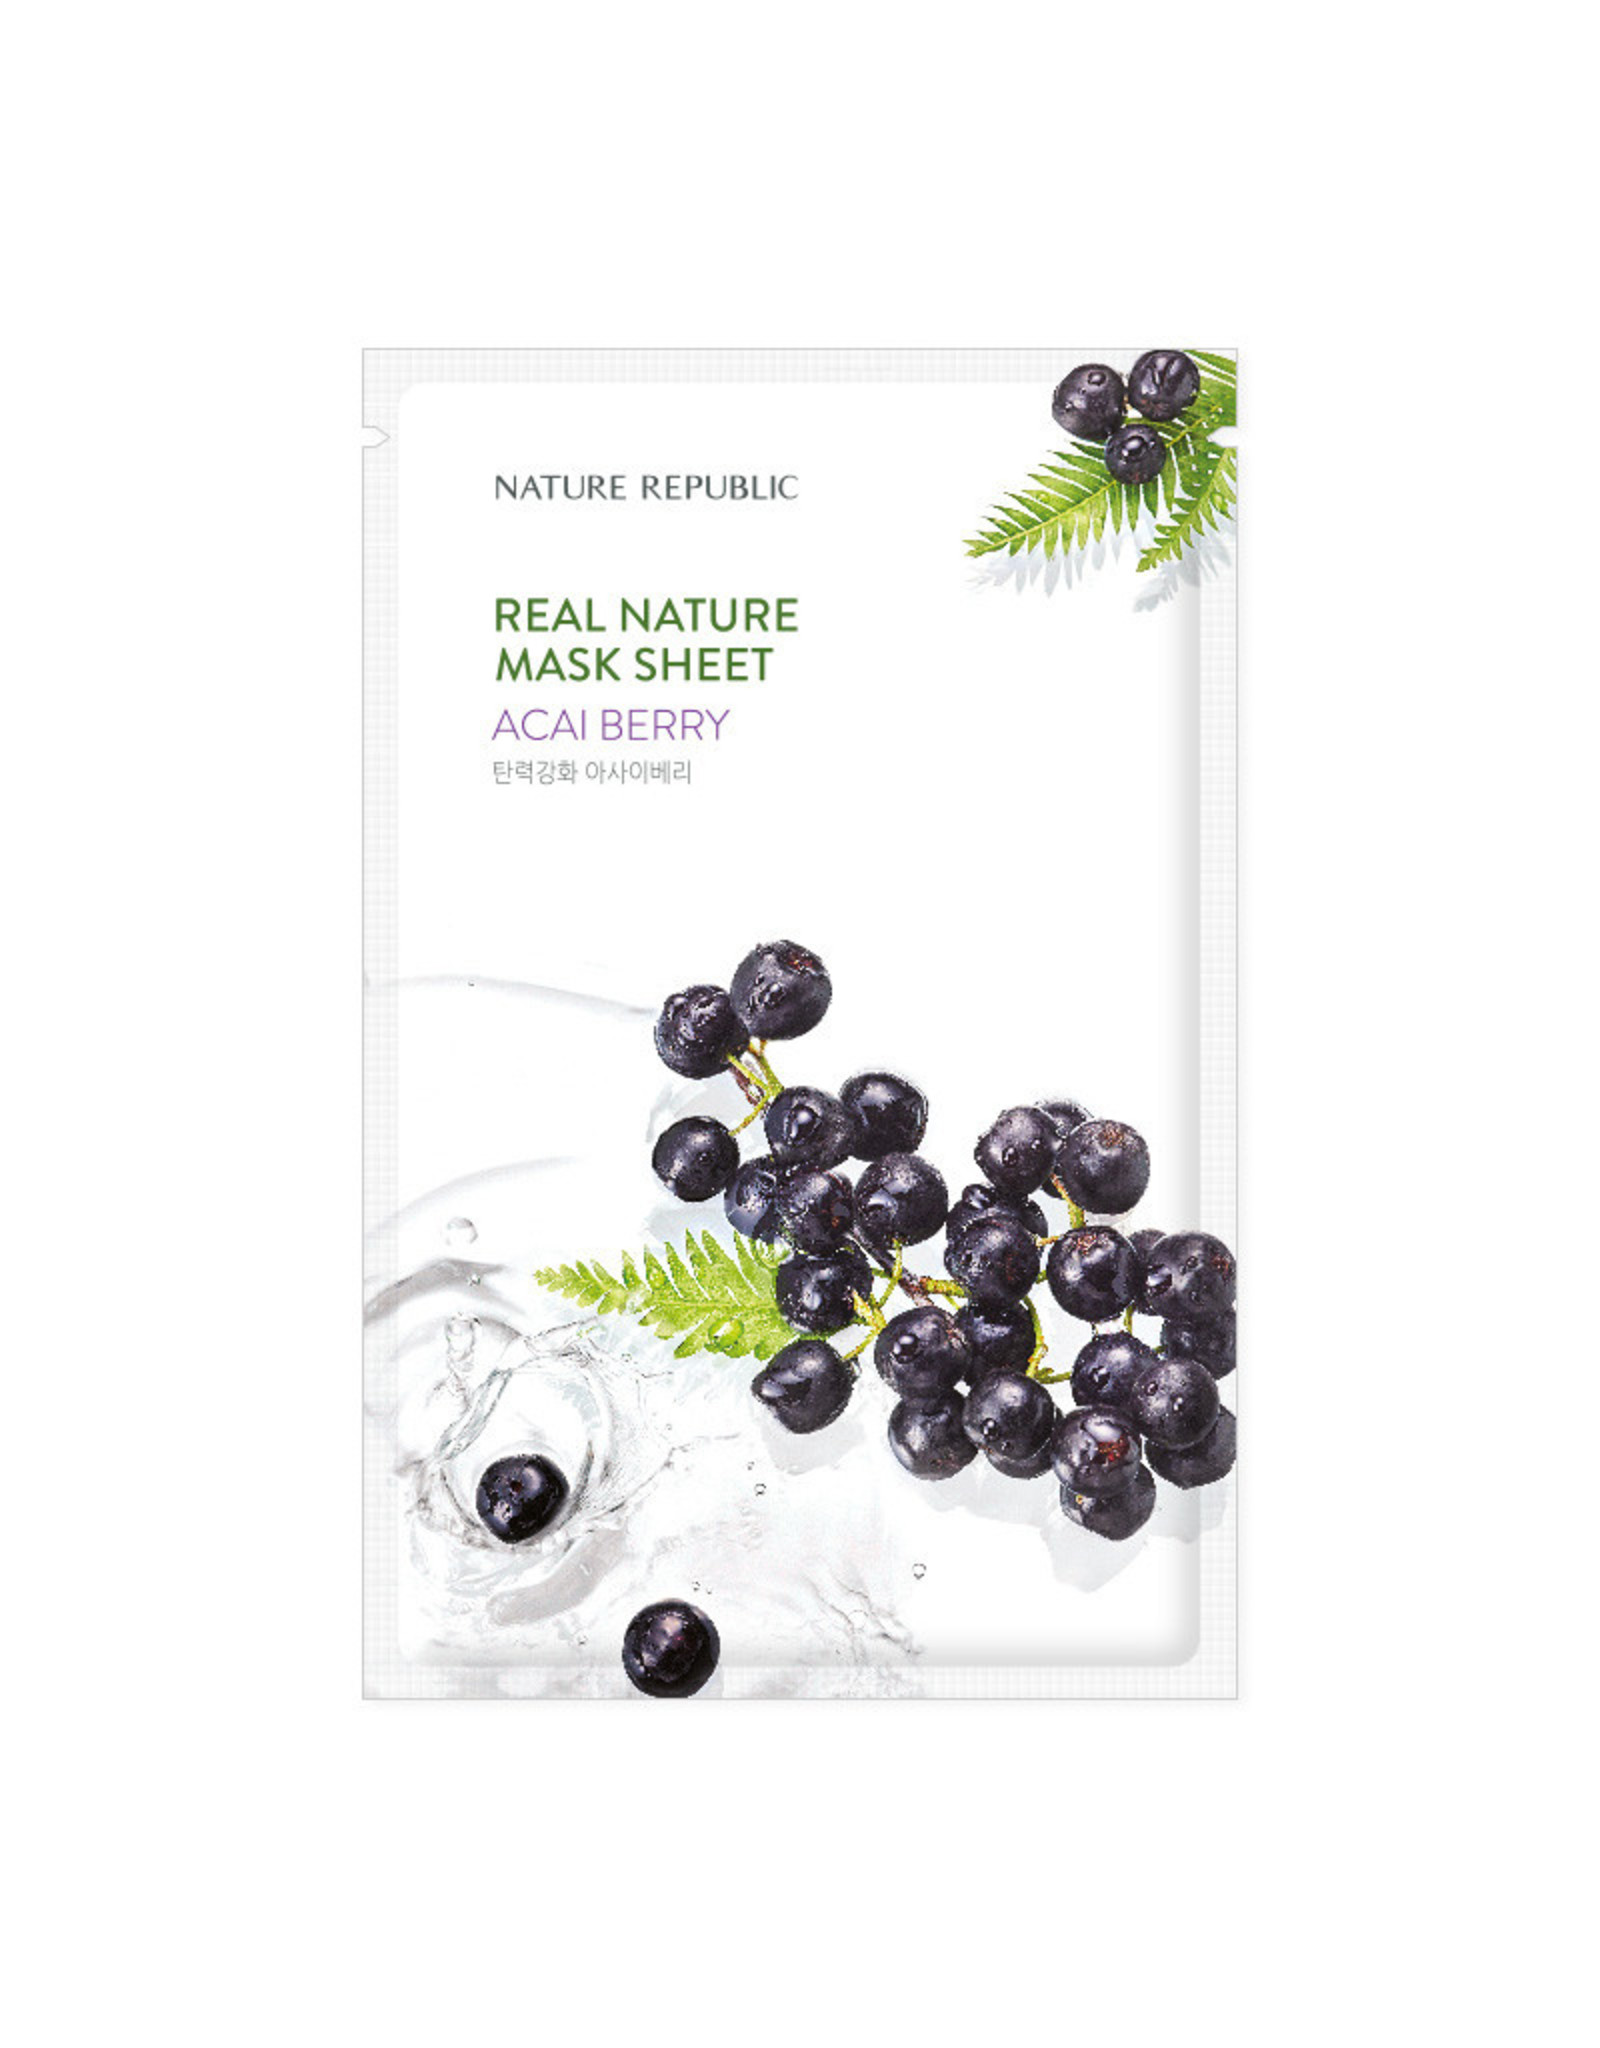 Real Nature Acai Berry Mask Sheet (Orig $1.90)